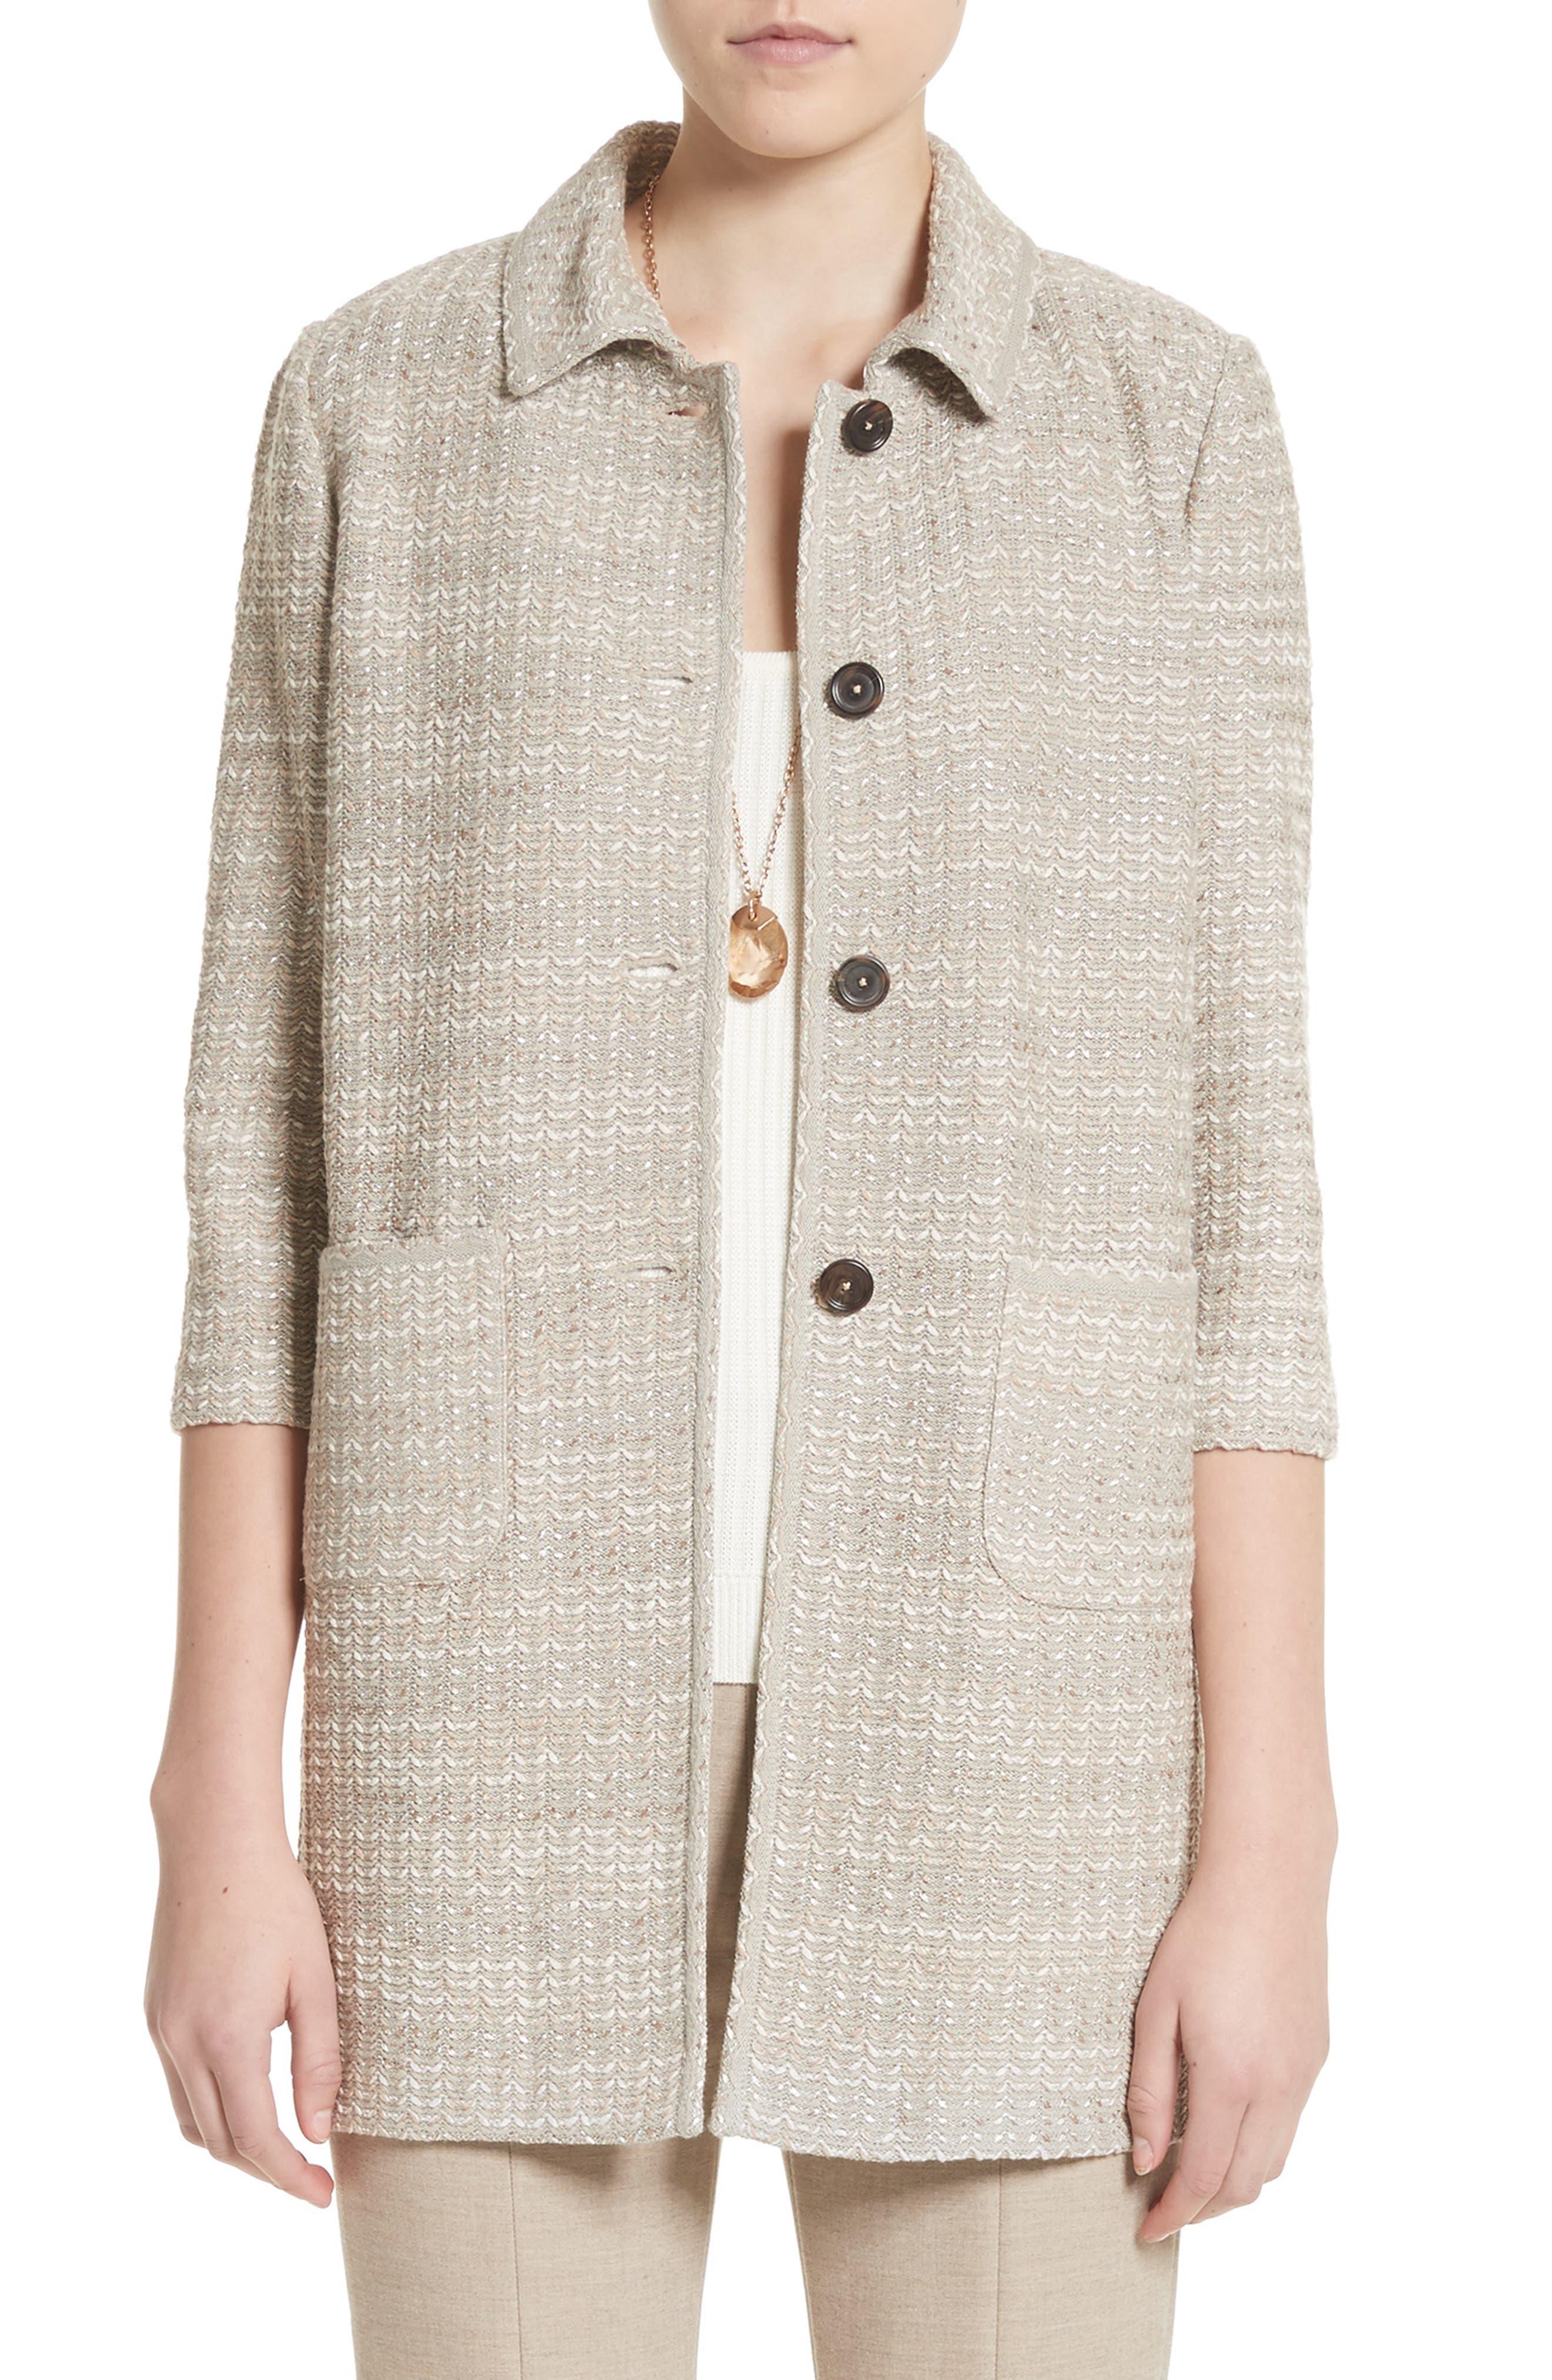 Alternate Image 1 Selected - St. John Collection Chevron Knit Shantung Jacket